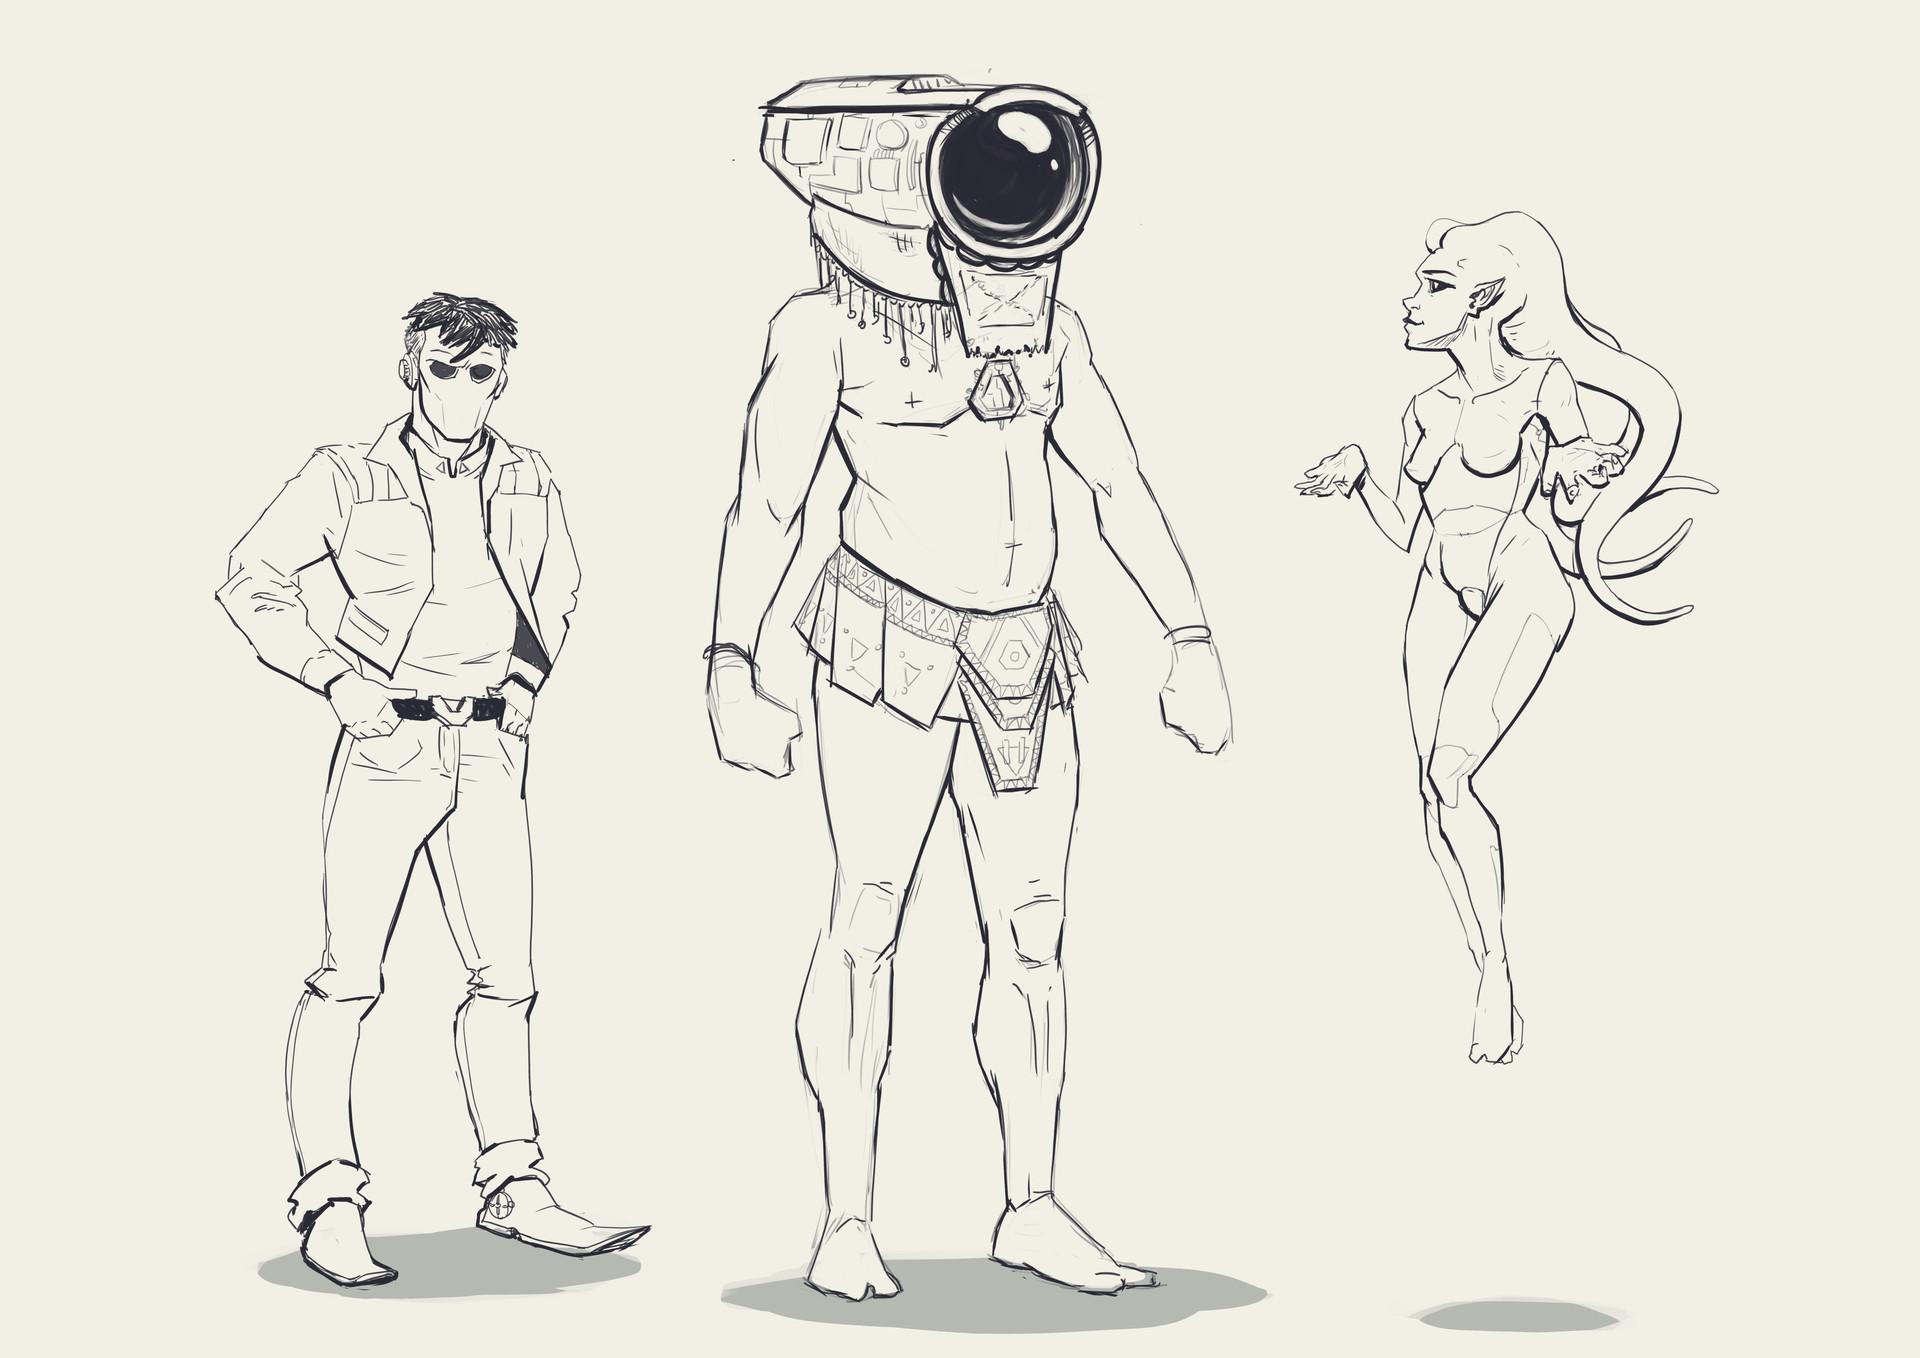 Jean philippe hugonnet 3 probots sketches